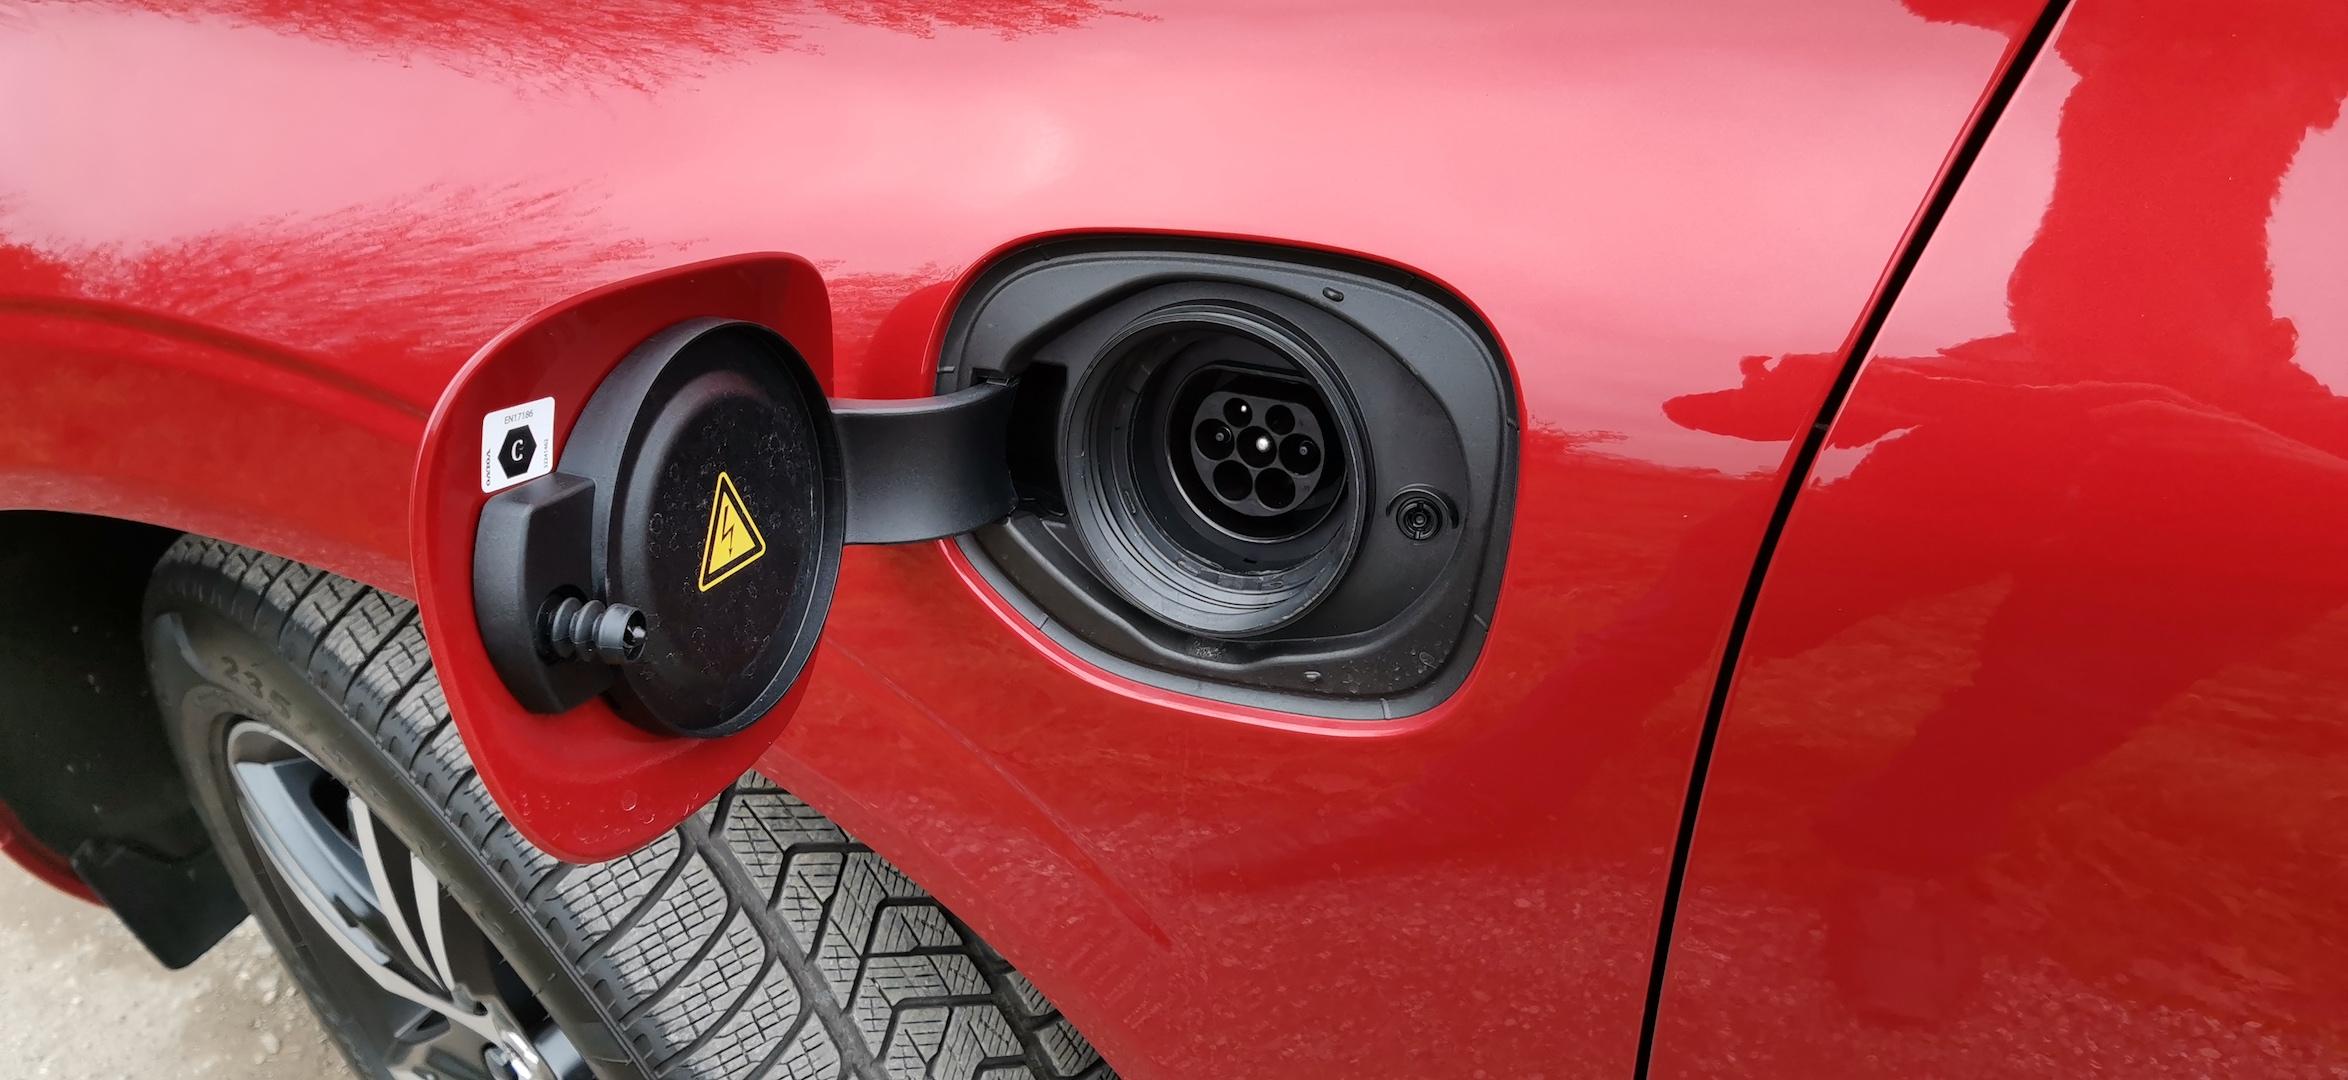 Volvo XC60 T6 AWD Recharge - zásuvka Mennekes